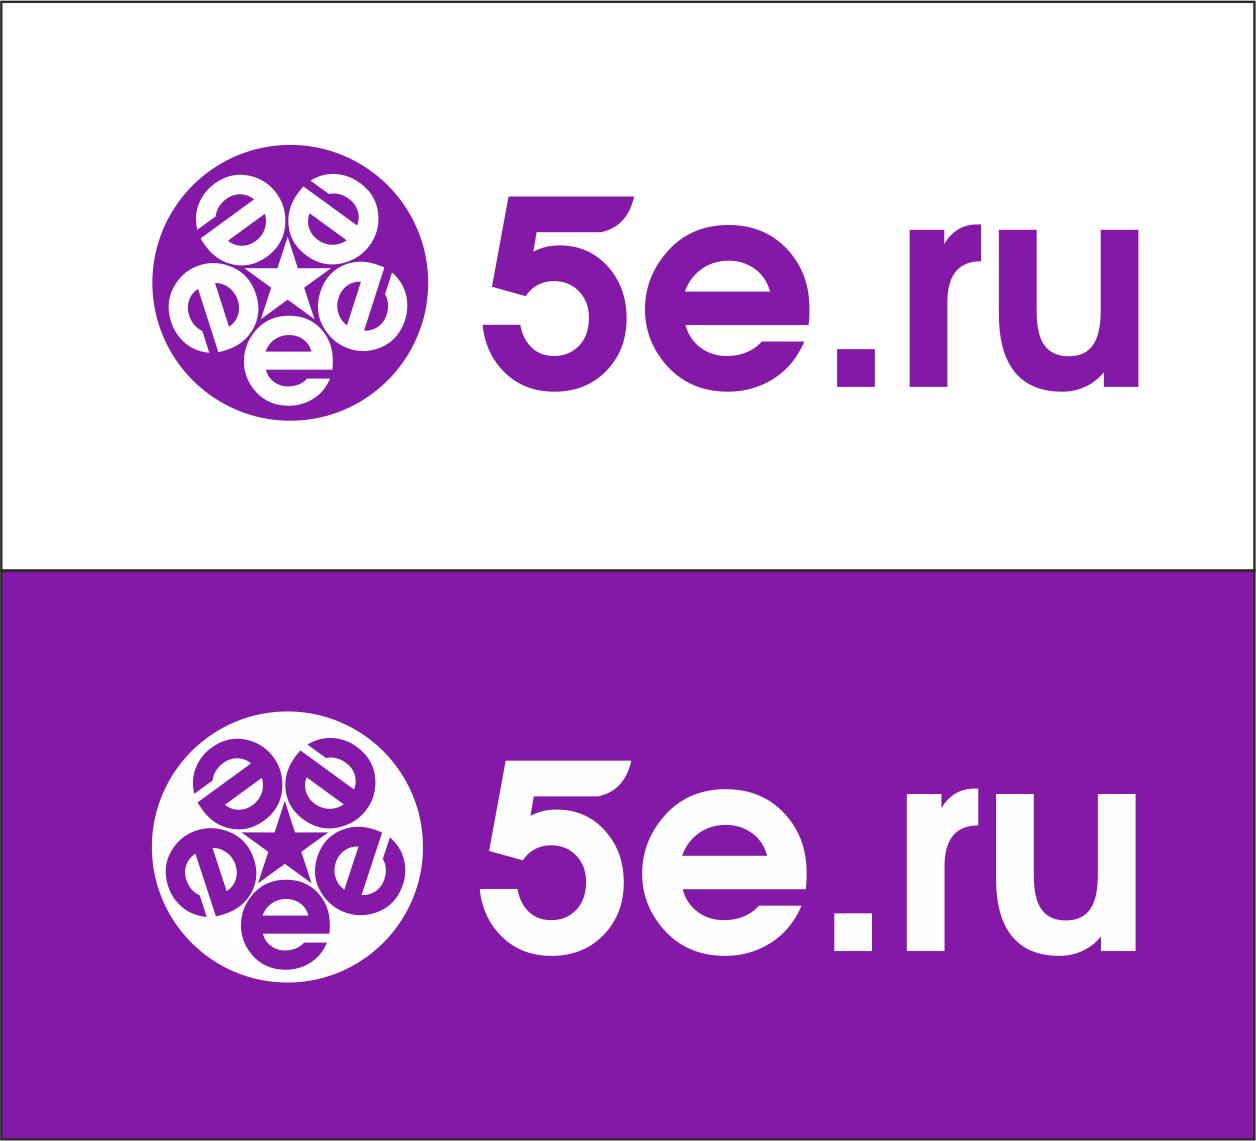 Нарисовать логотип для группы компаний  фото f_8625cdce284522eb.png